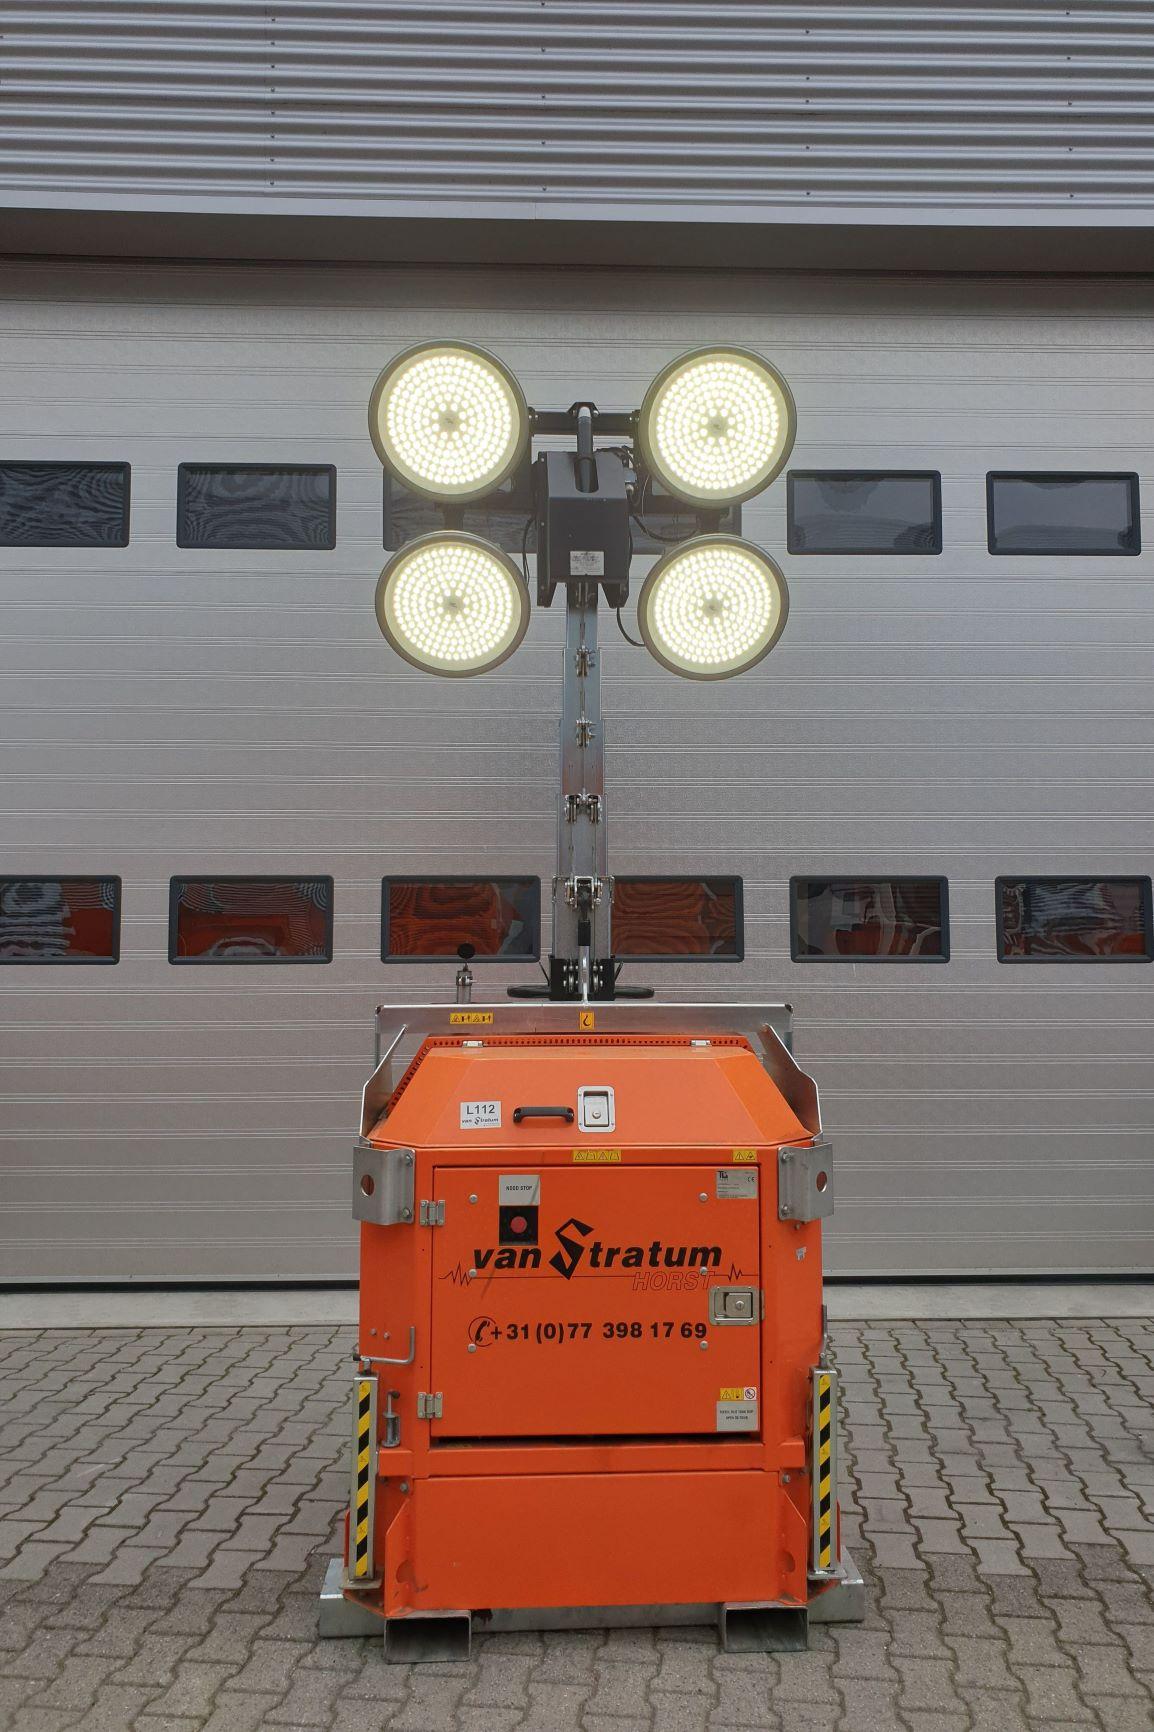 Cube mit LED-lampen